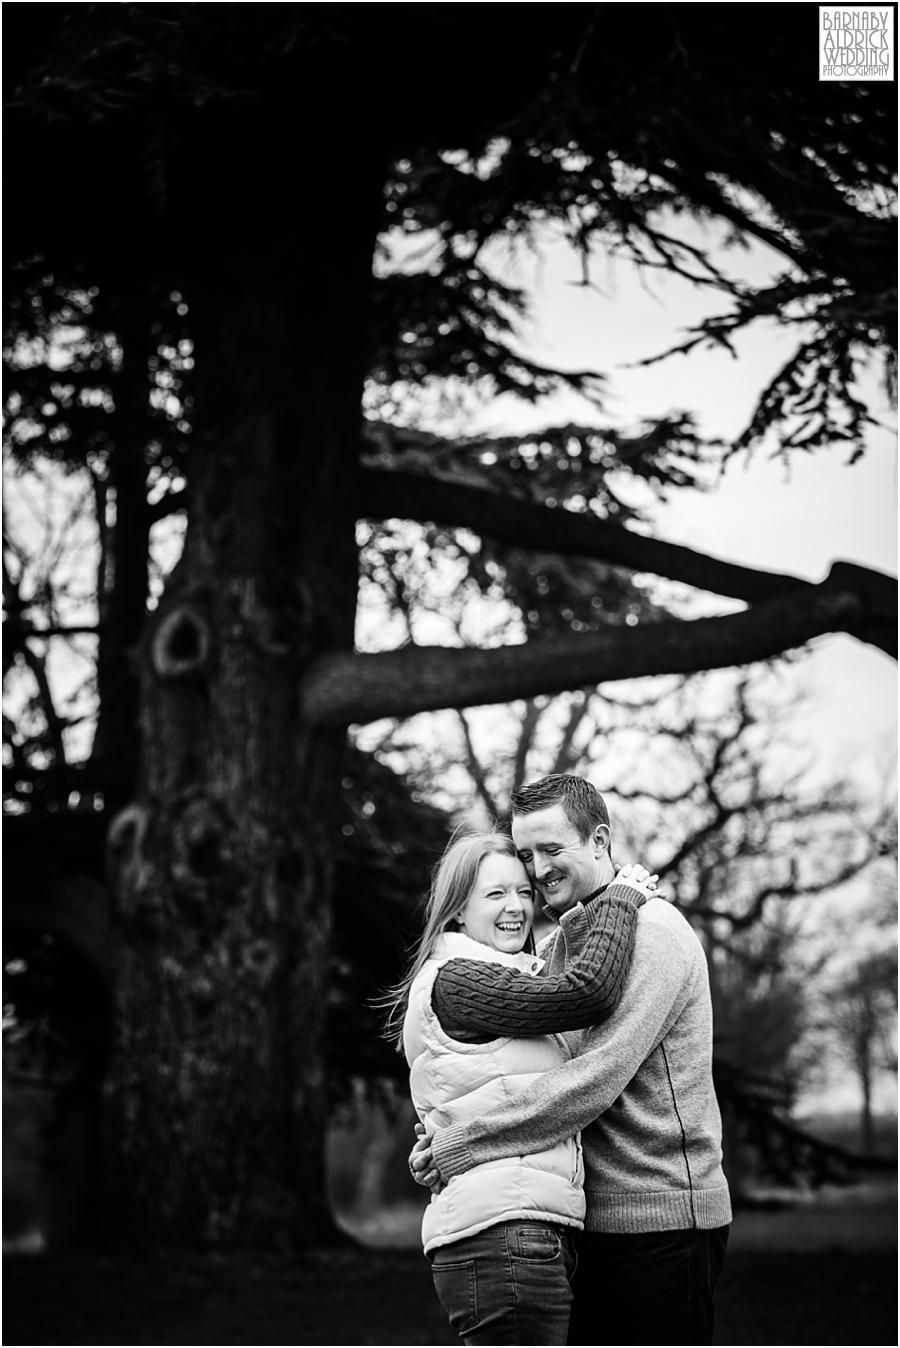 Stubton Hall Pre-Wedding Photography by Barnaby Aldrick 008.jpg